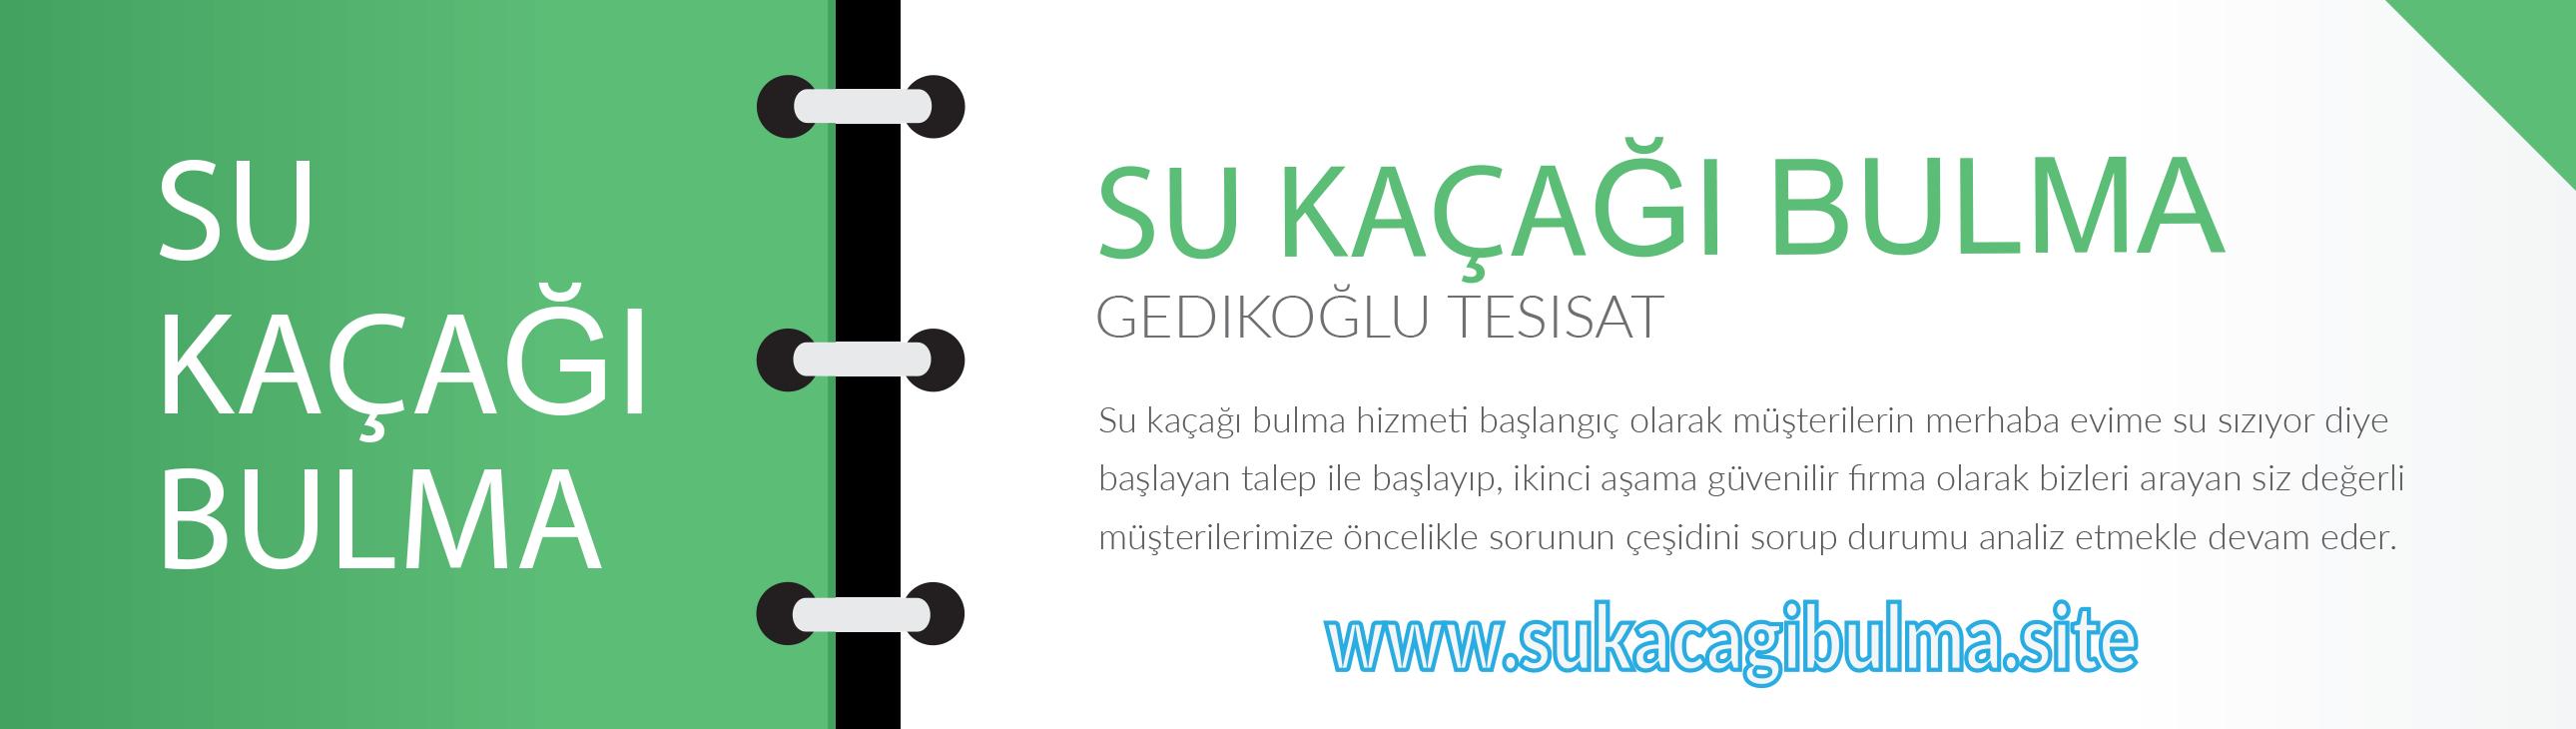 su_kacagi_bulma_afis